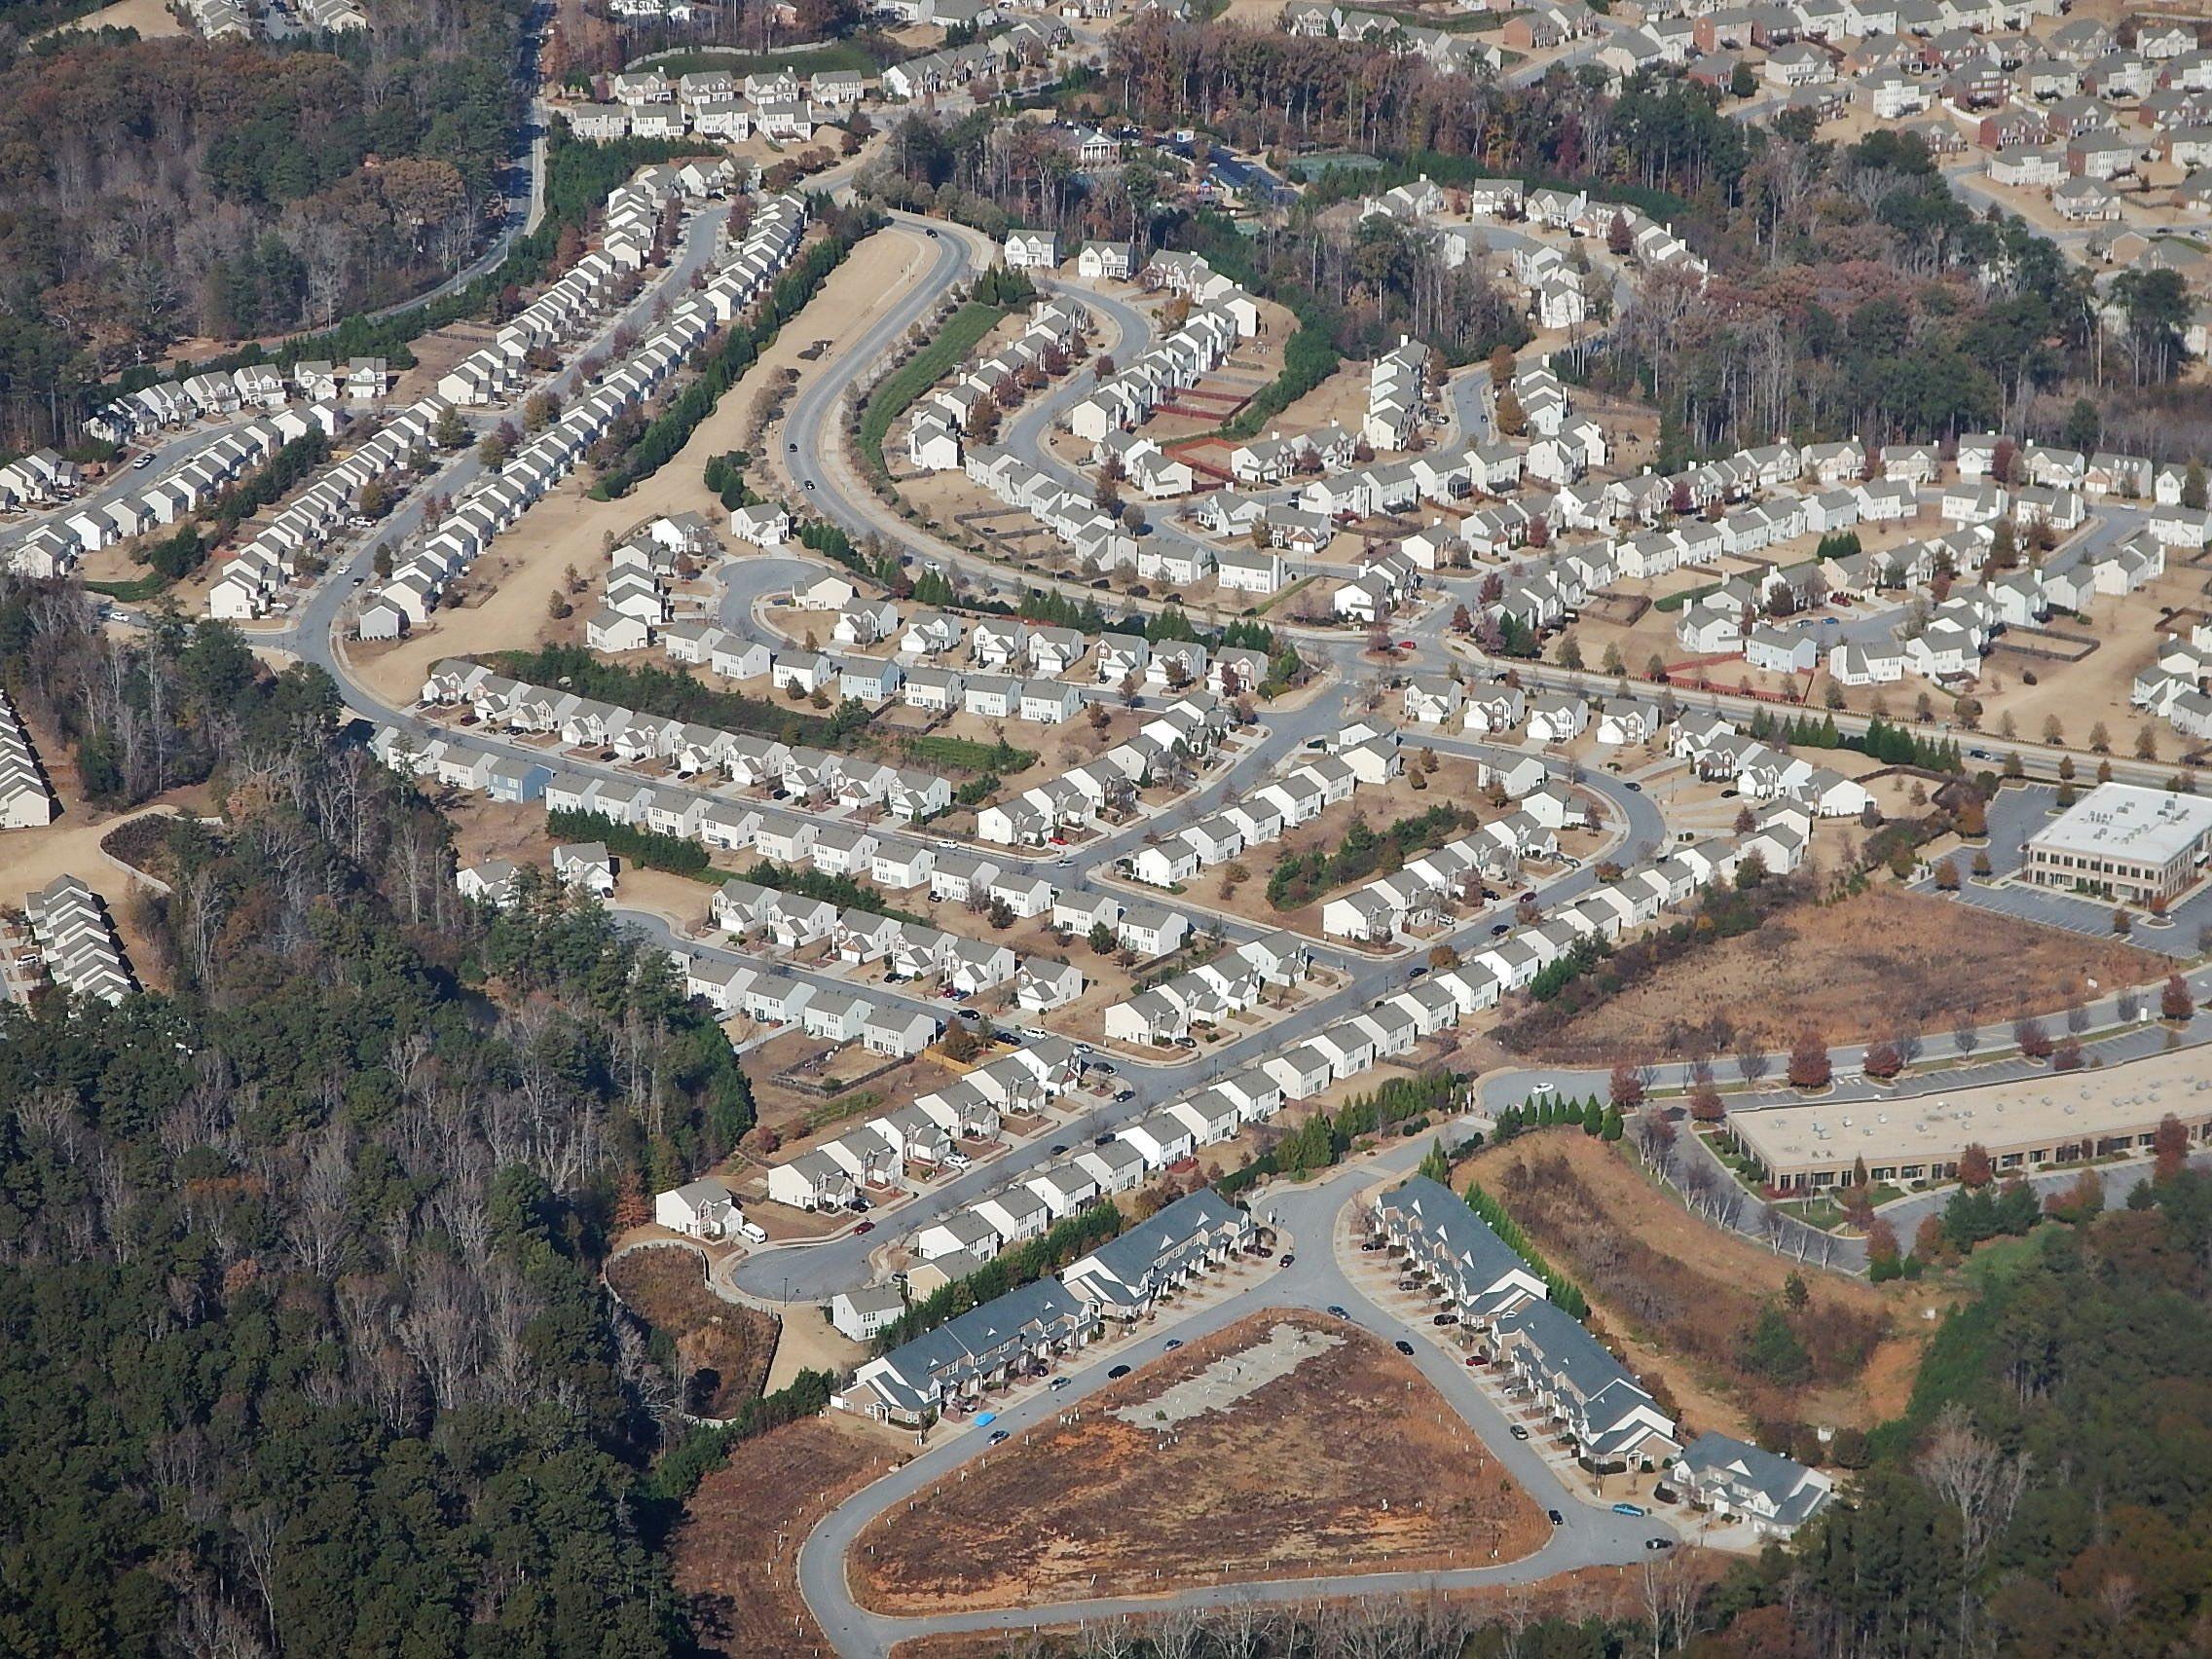 Suburban Atlanta (Source: Wikimedia Commons)